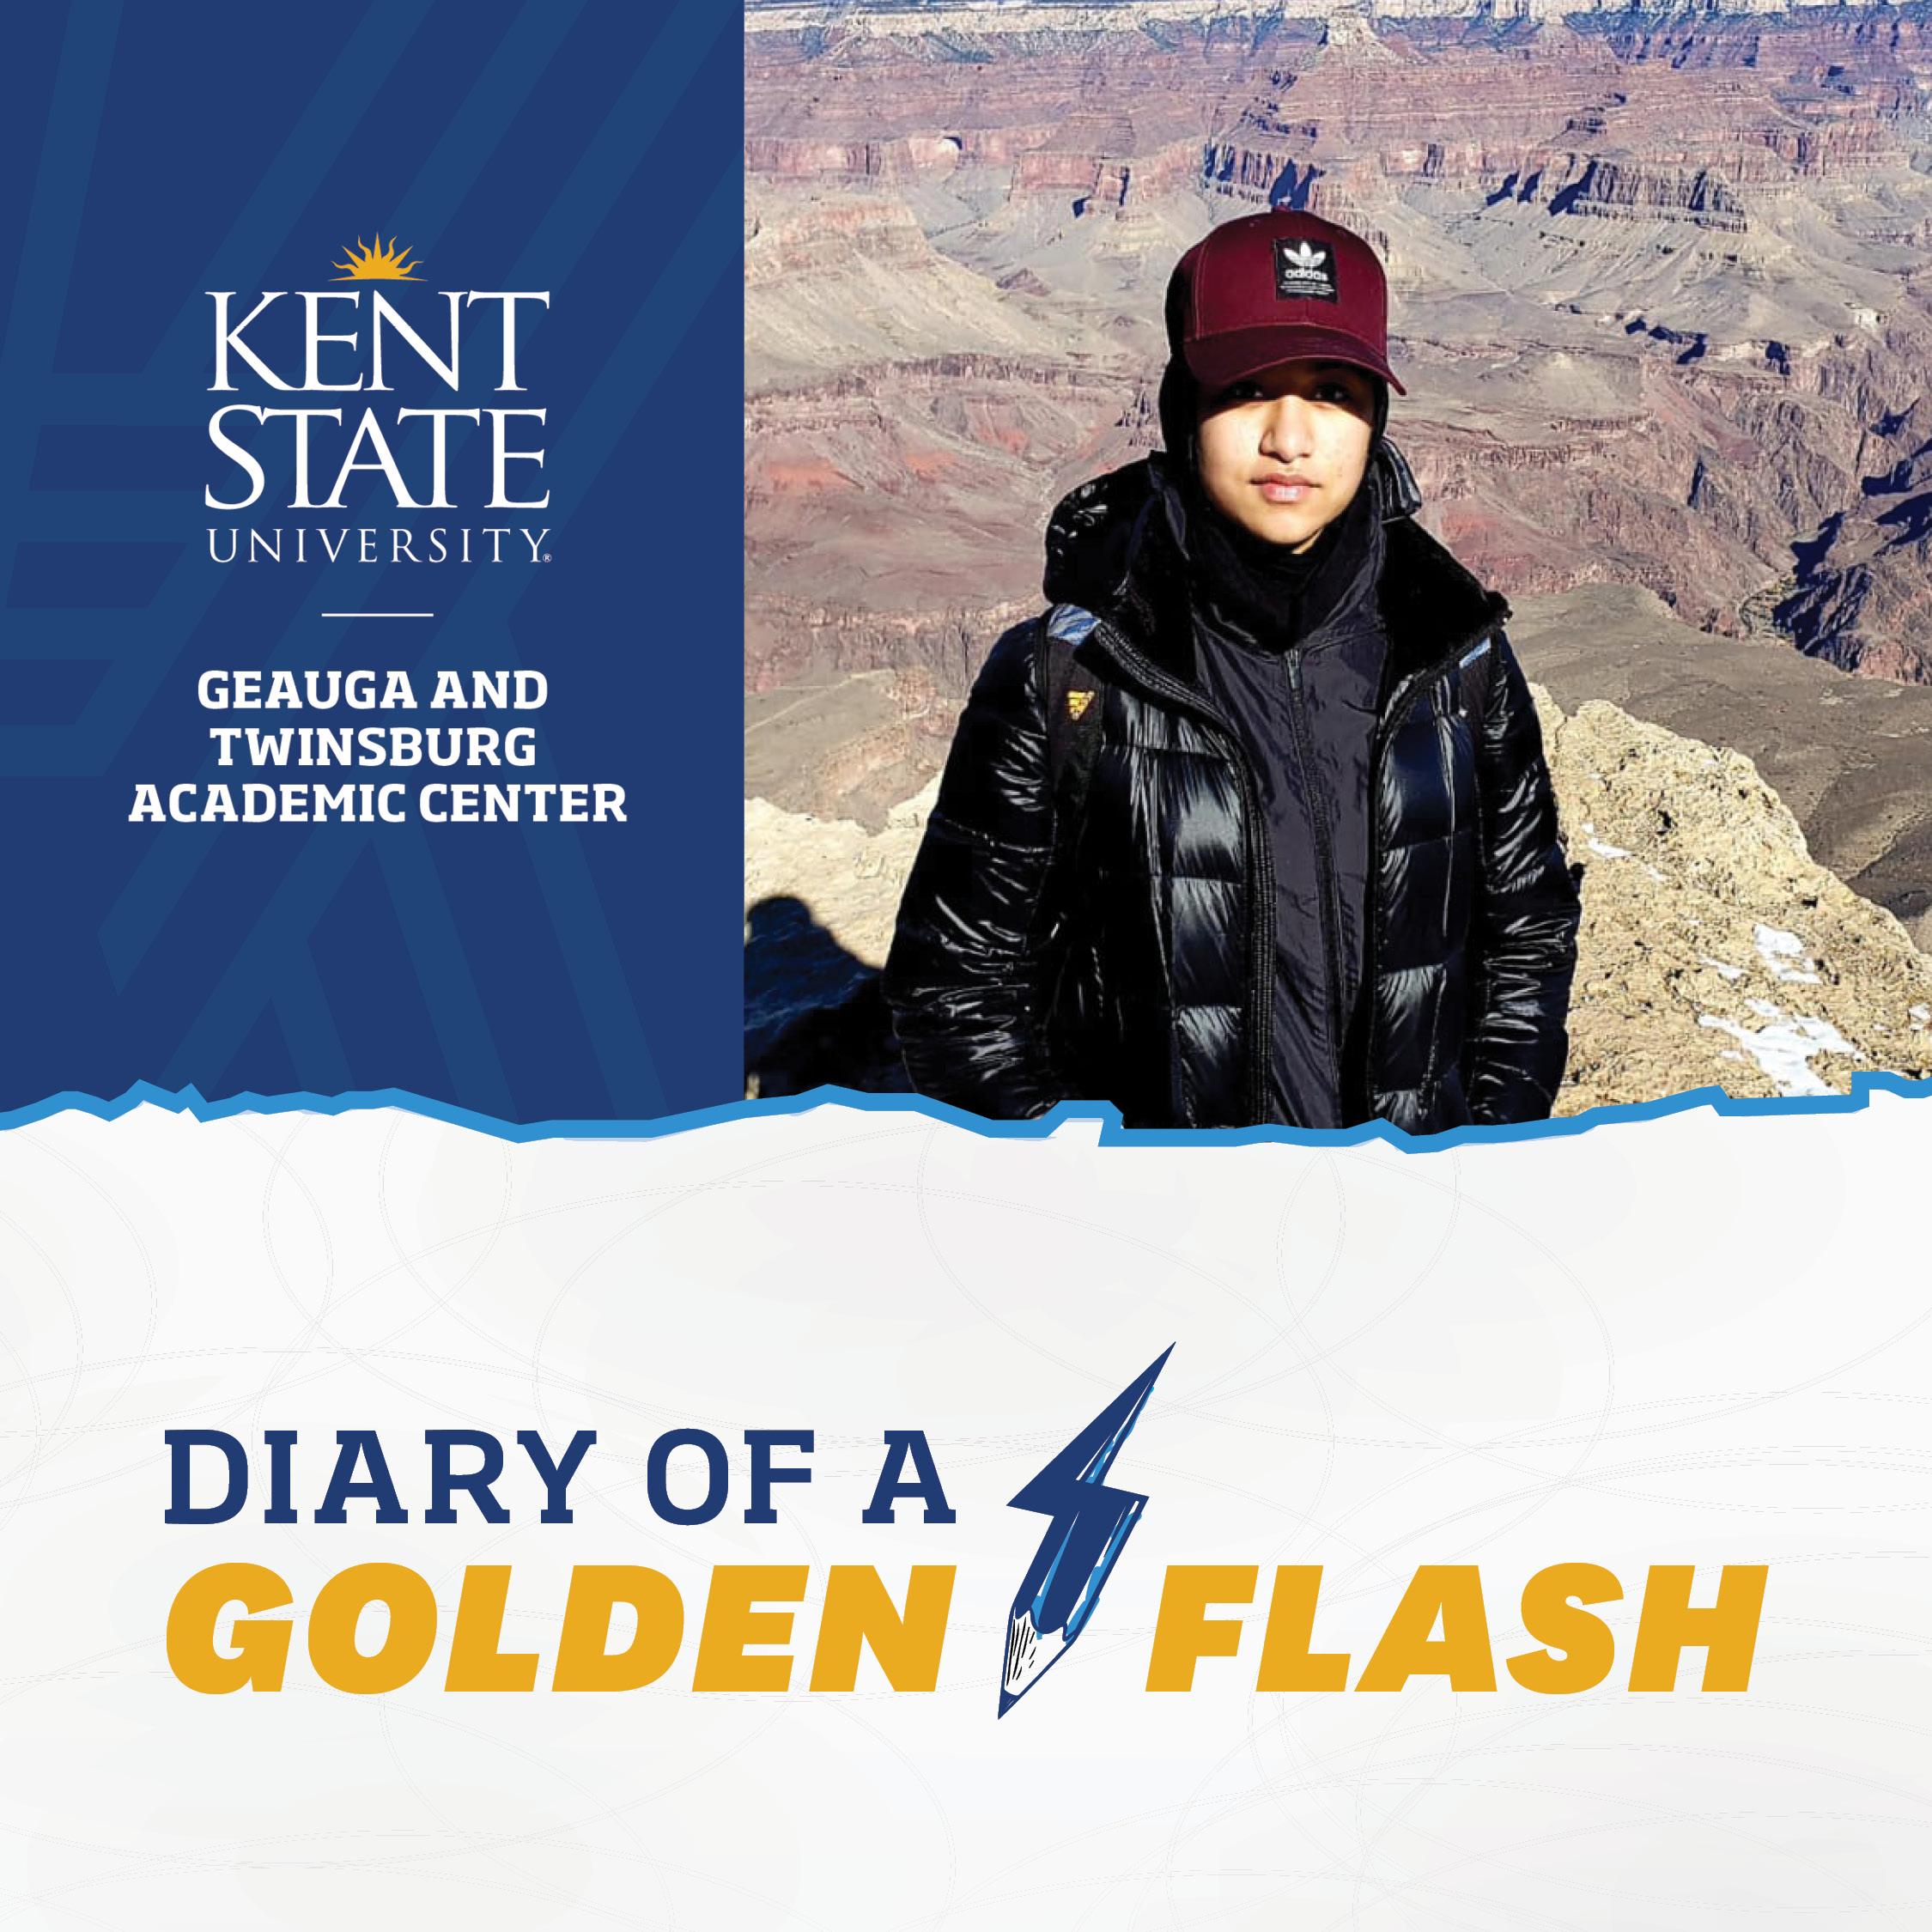 Diary of a Golden Flash Isra Shaikh